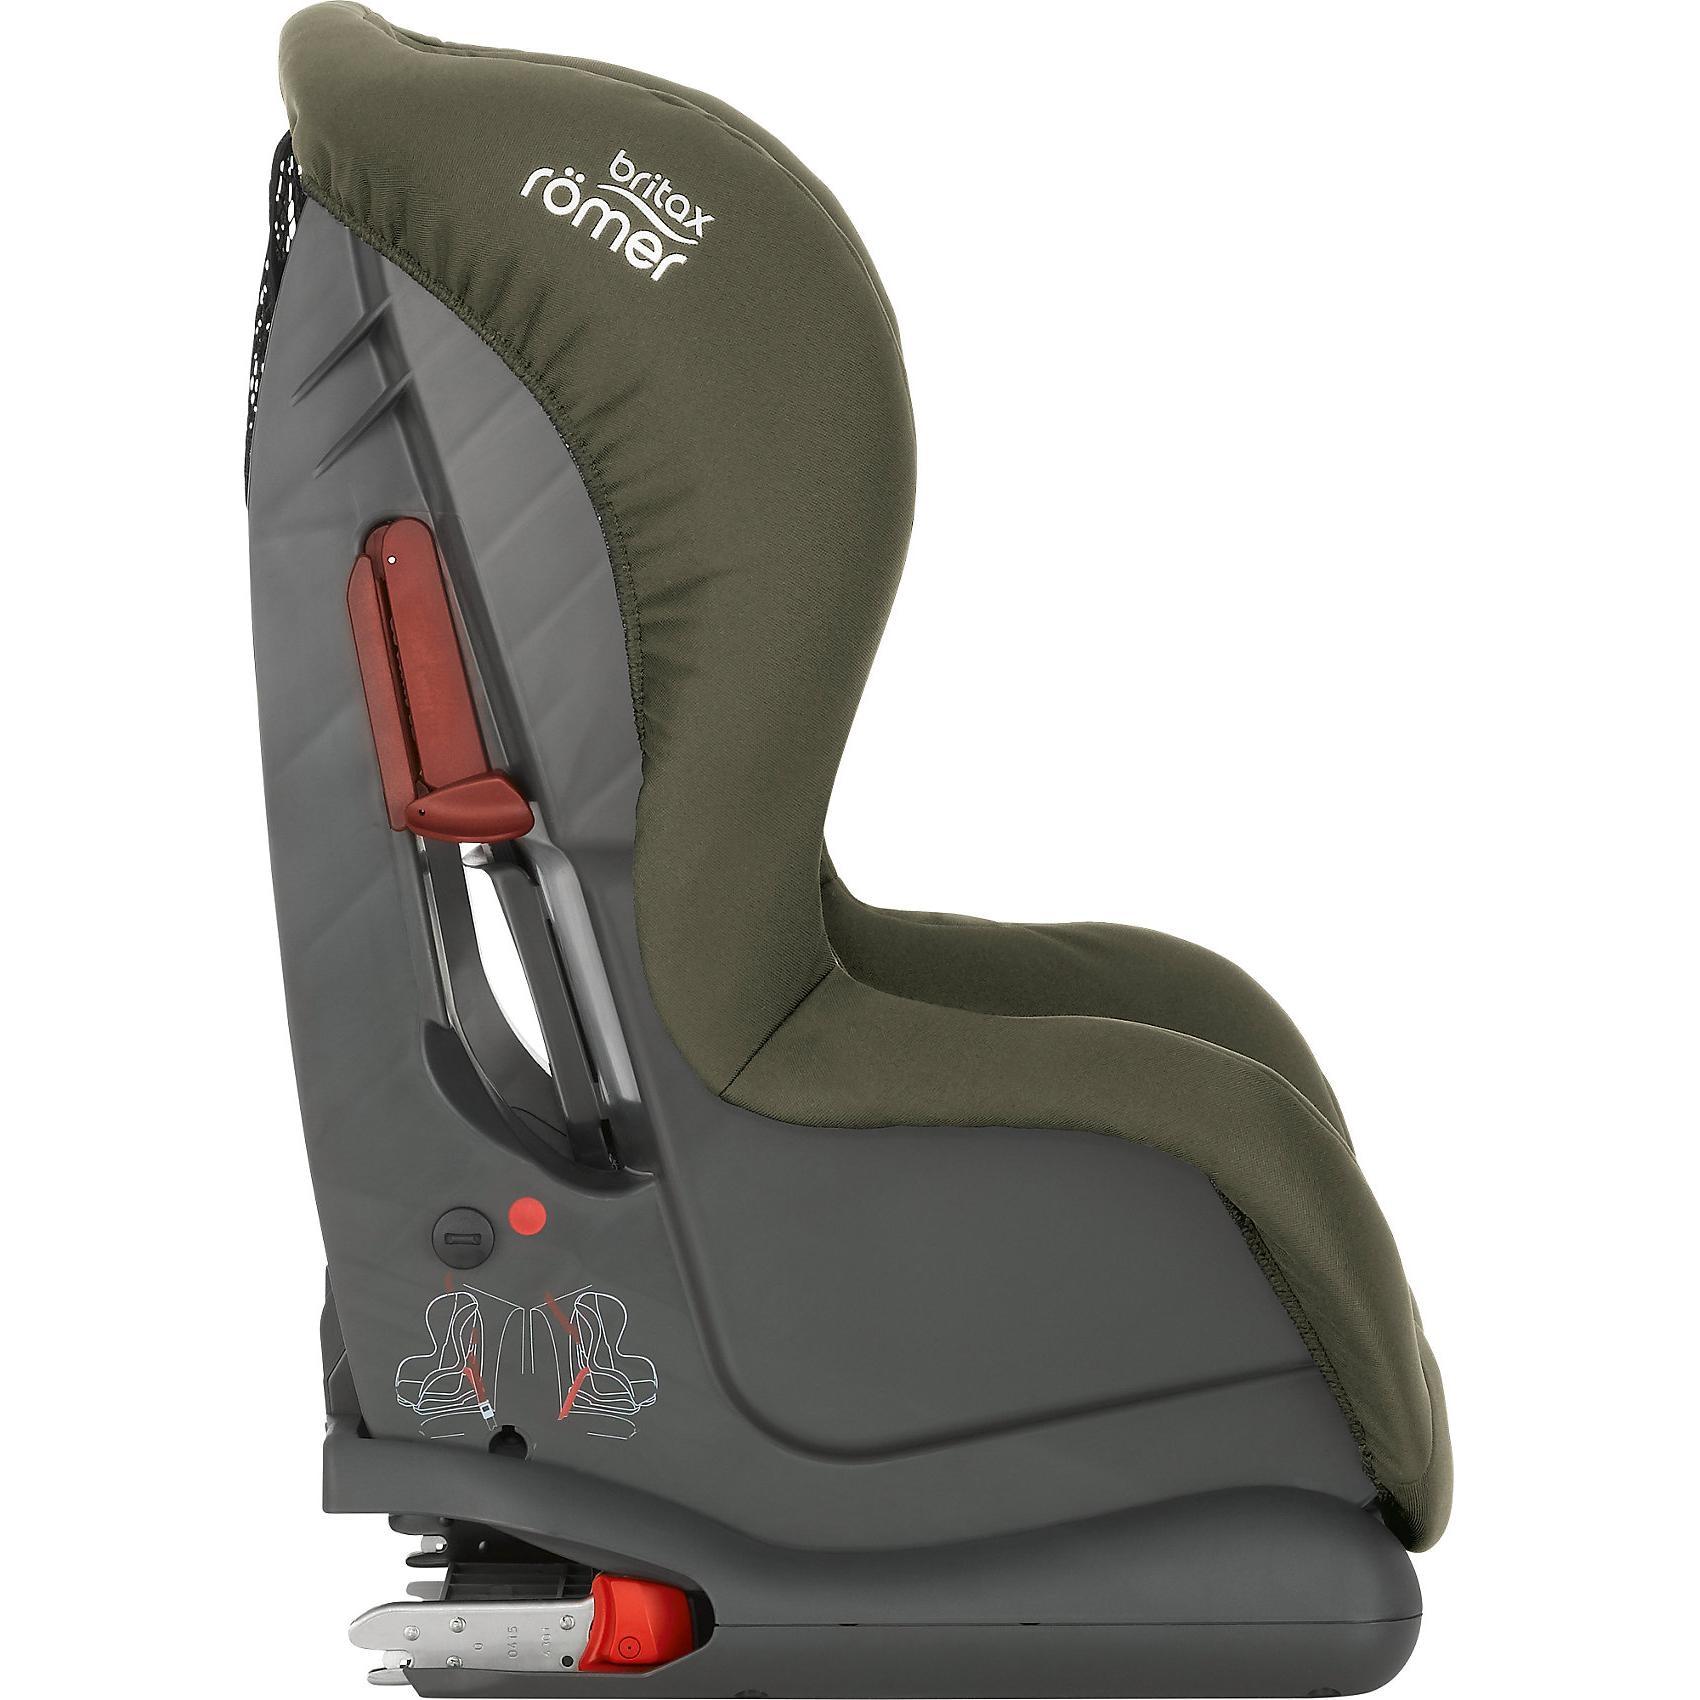 Britax Römer Auto-Kindersitz Duo Plus Olive Green 2018